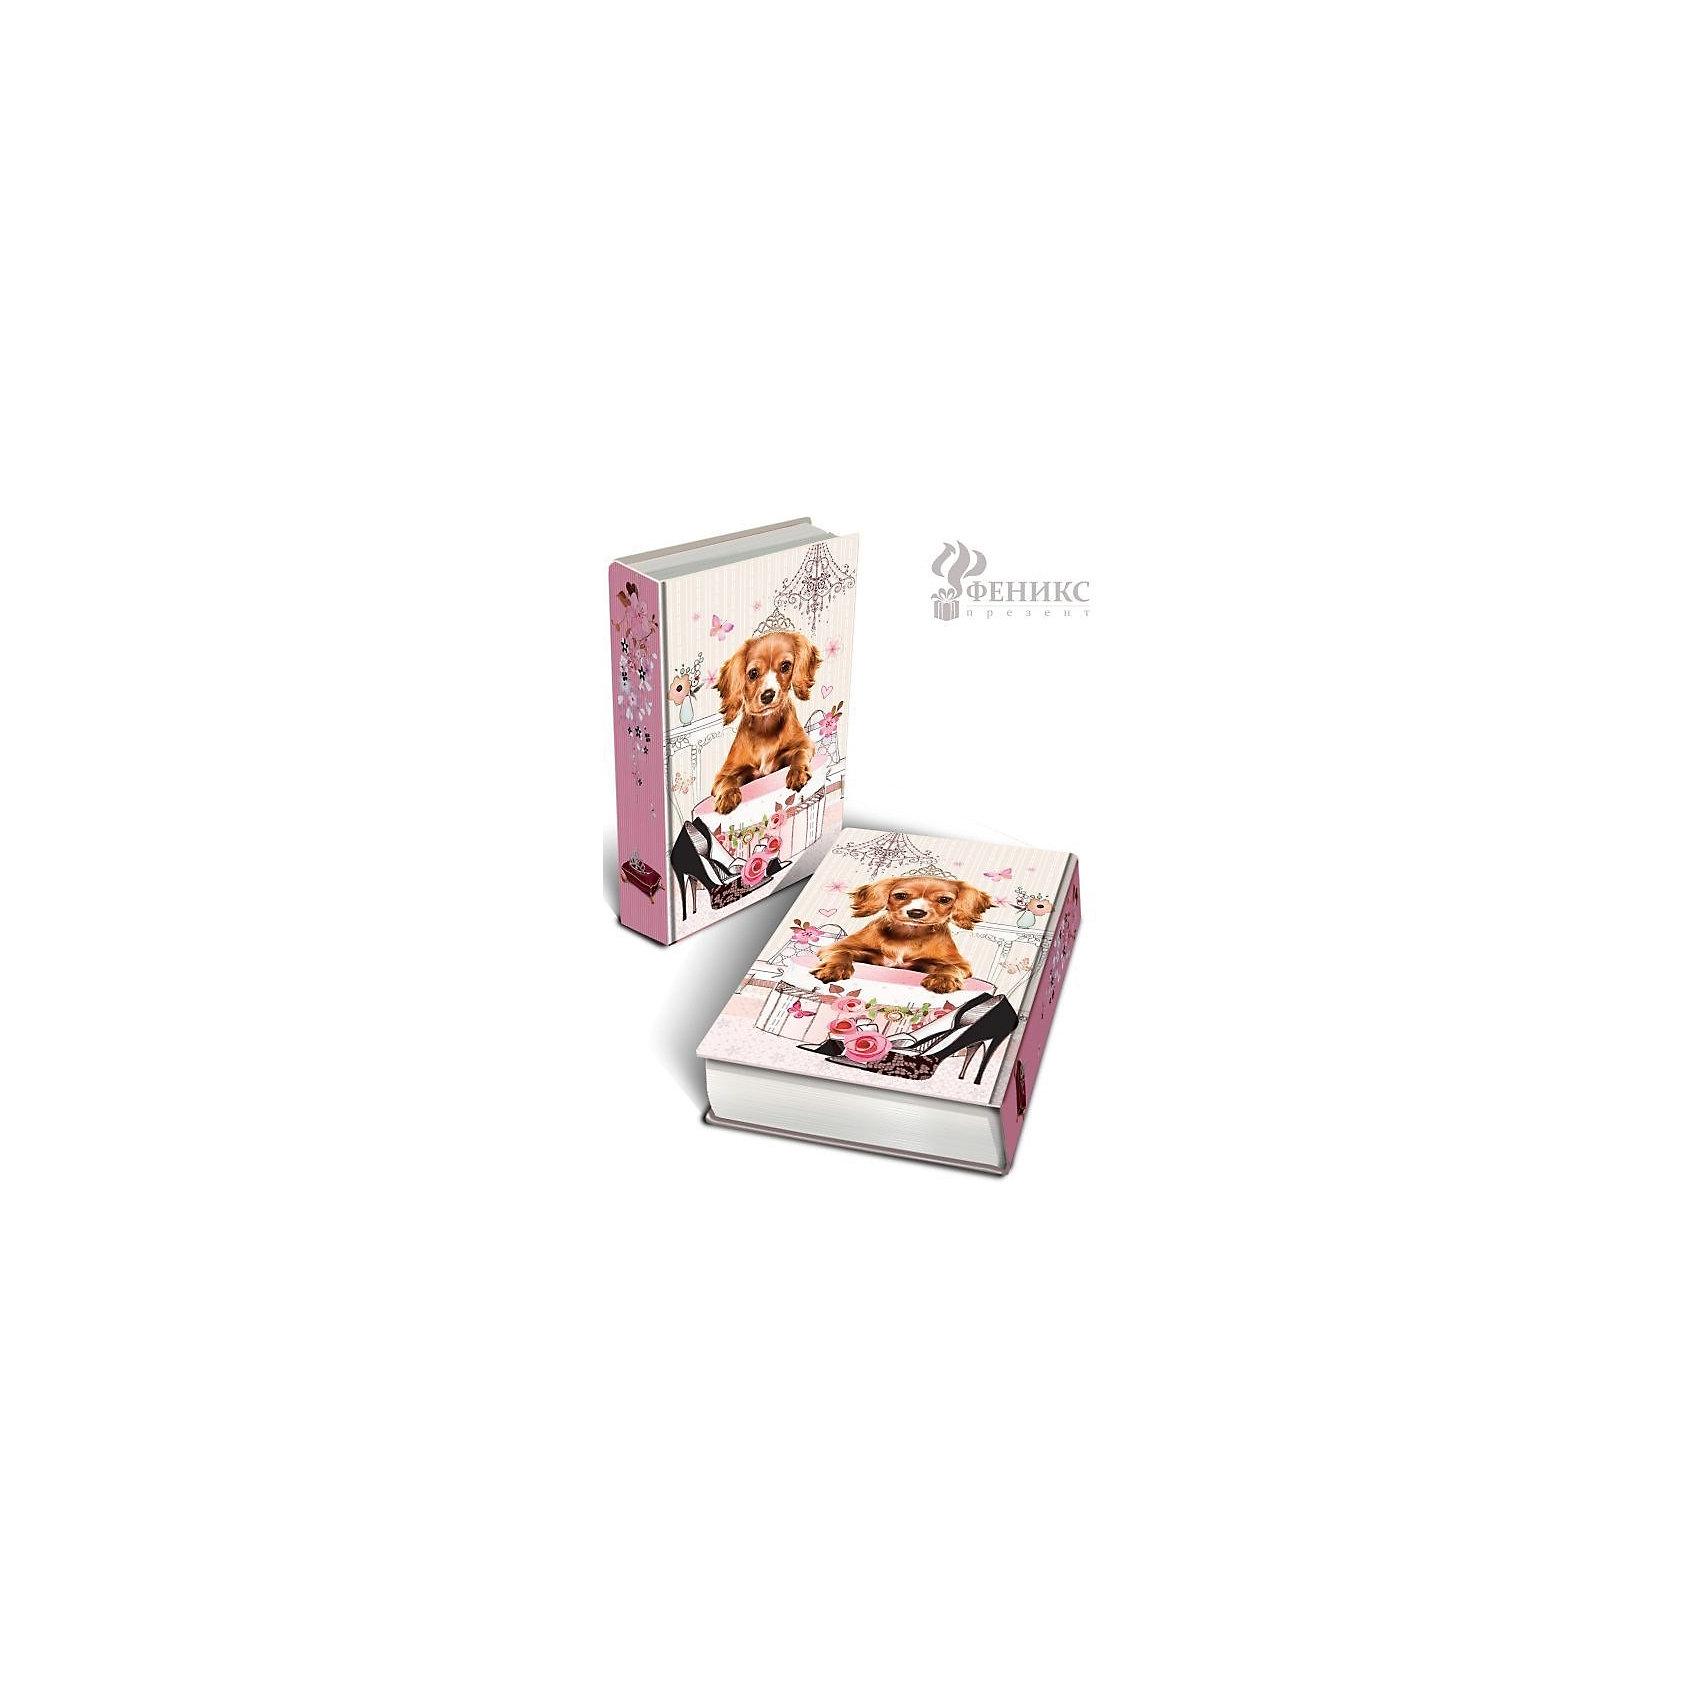 Феникс-Презент Шкатулка декоративная Принцесса (17*11*5 см) шкатулка декоративная zw001080 28 5 20 5 7см